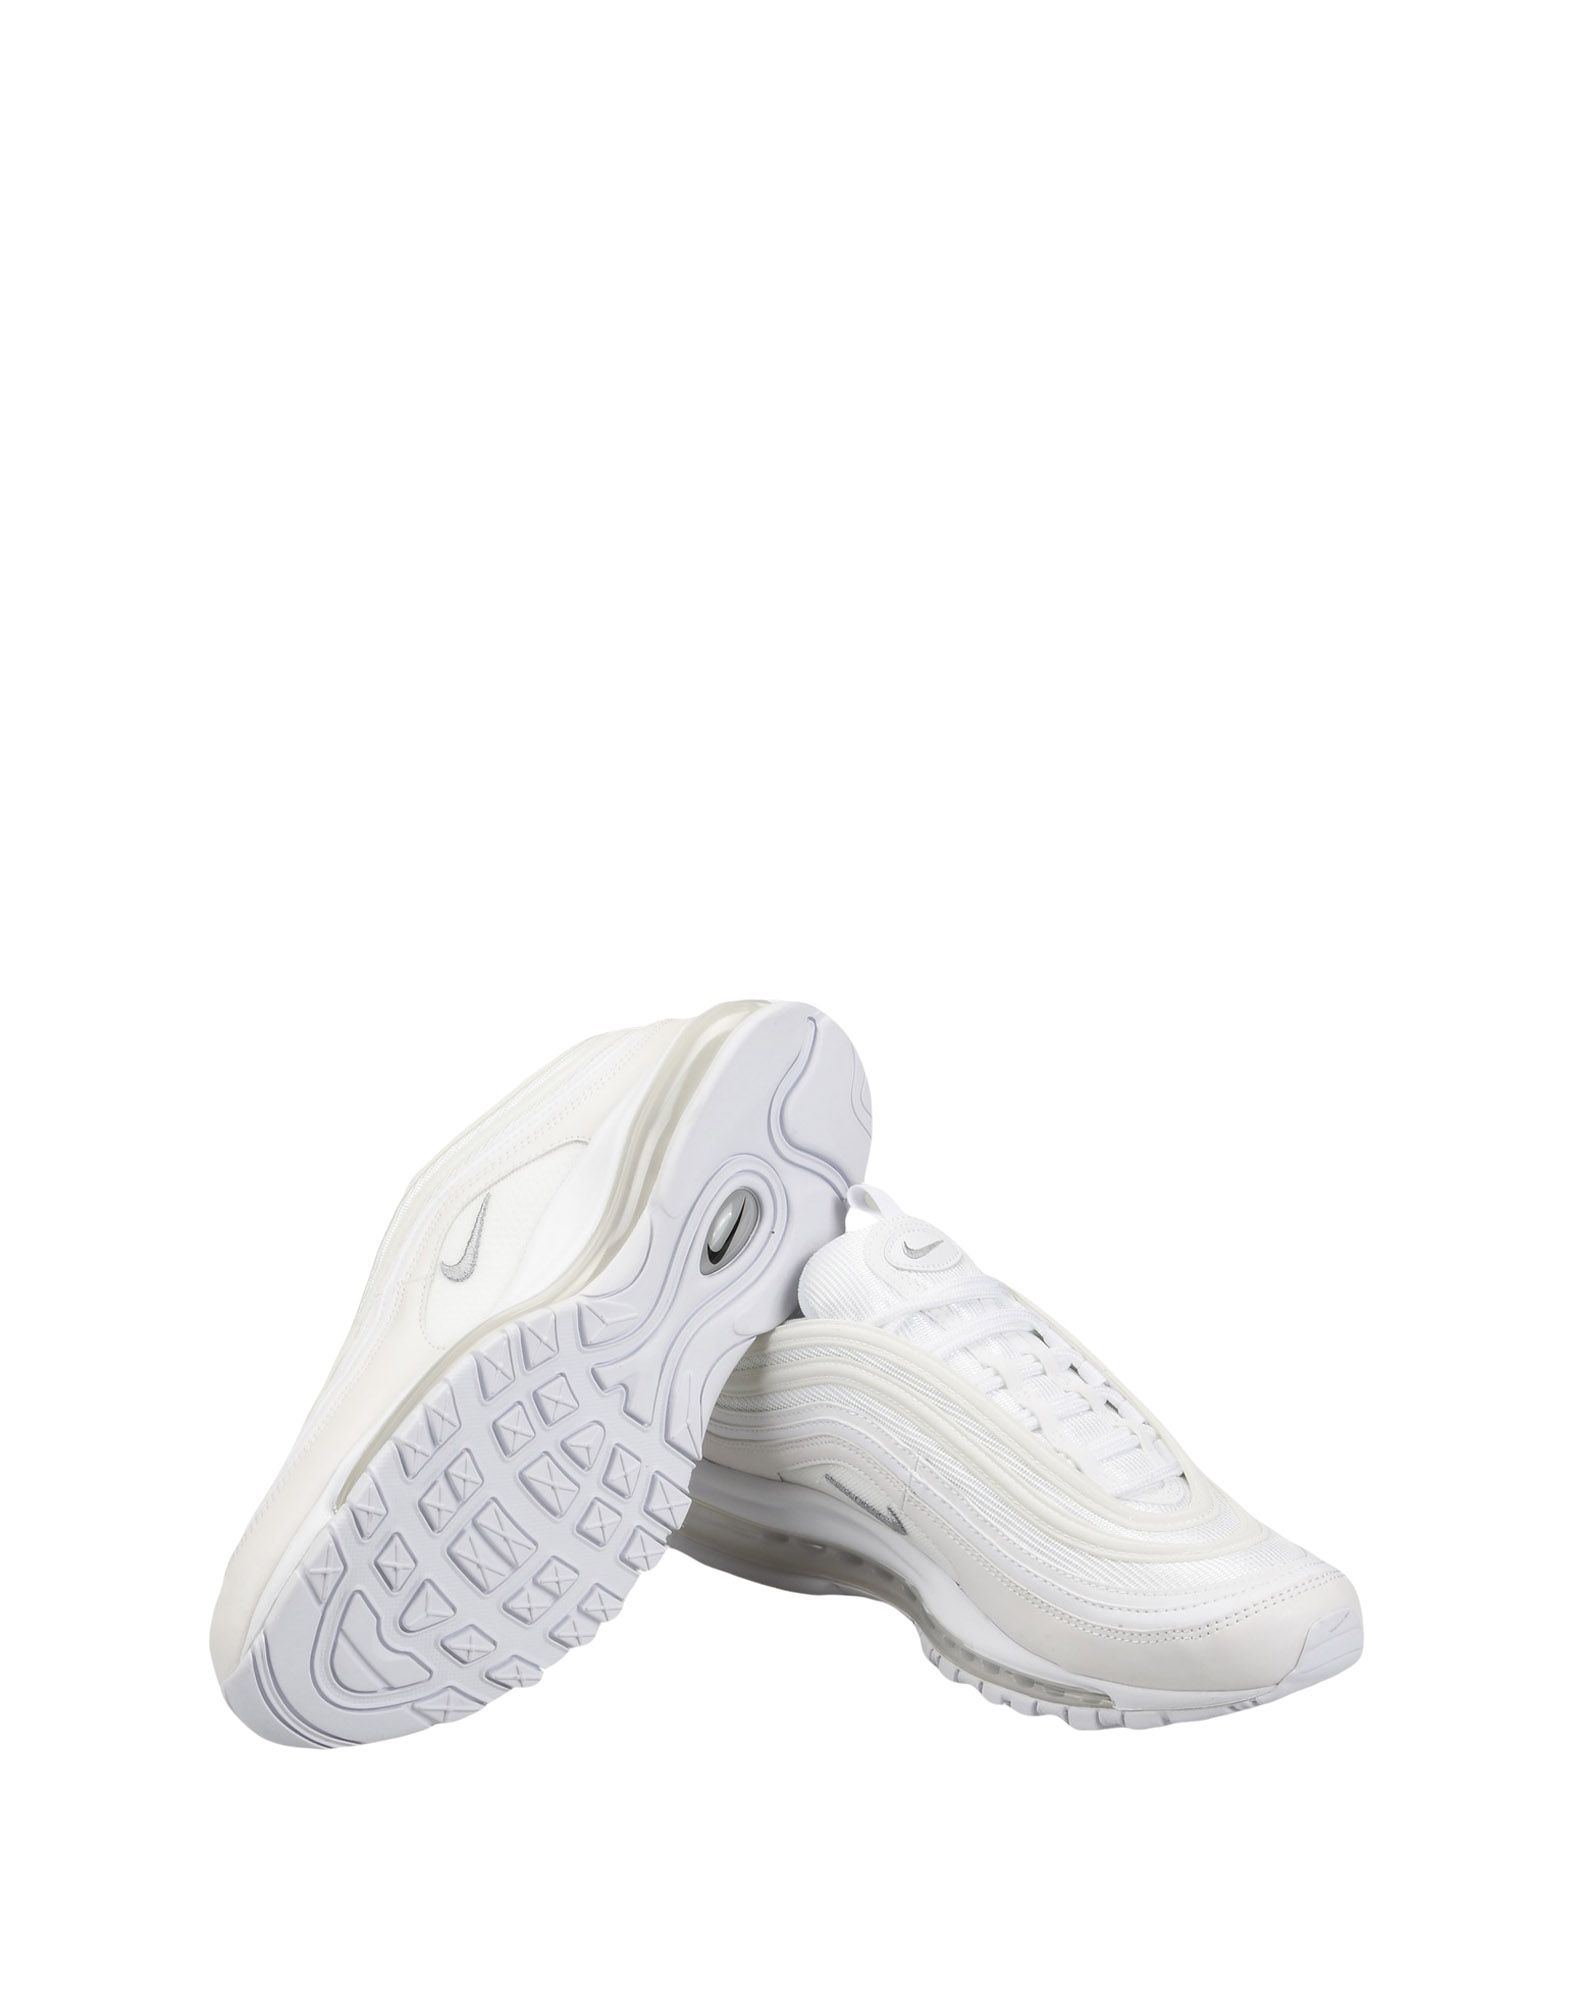 Nike  Air Max 97 beliebte  11489284AK Gute Qualität beliebte 97 Schuhe 616831